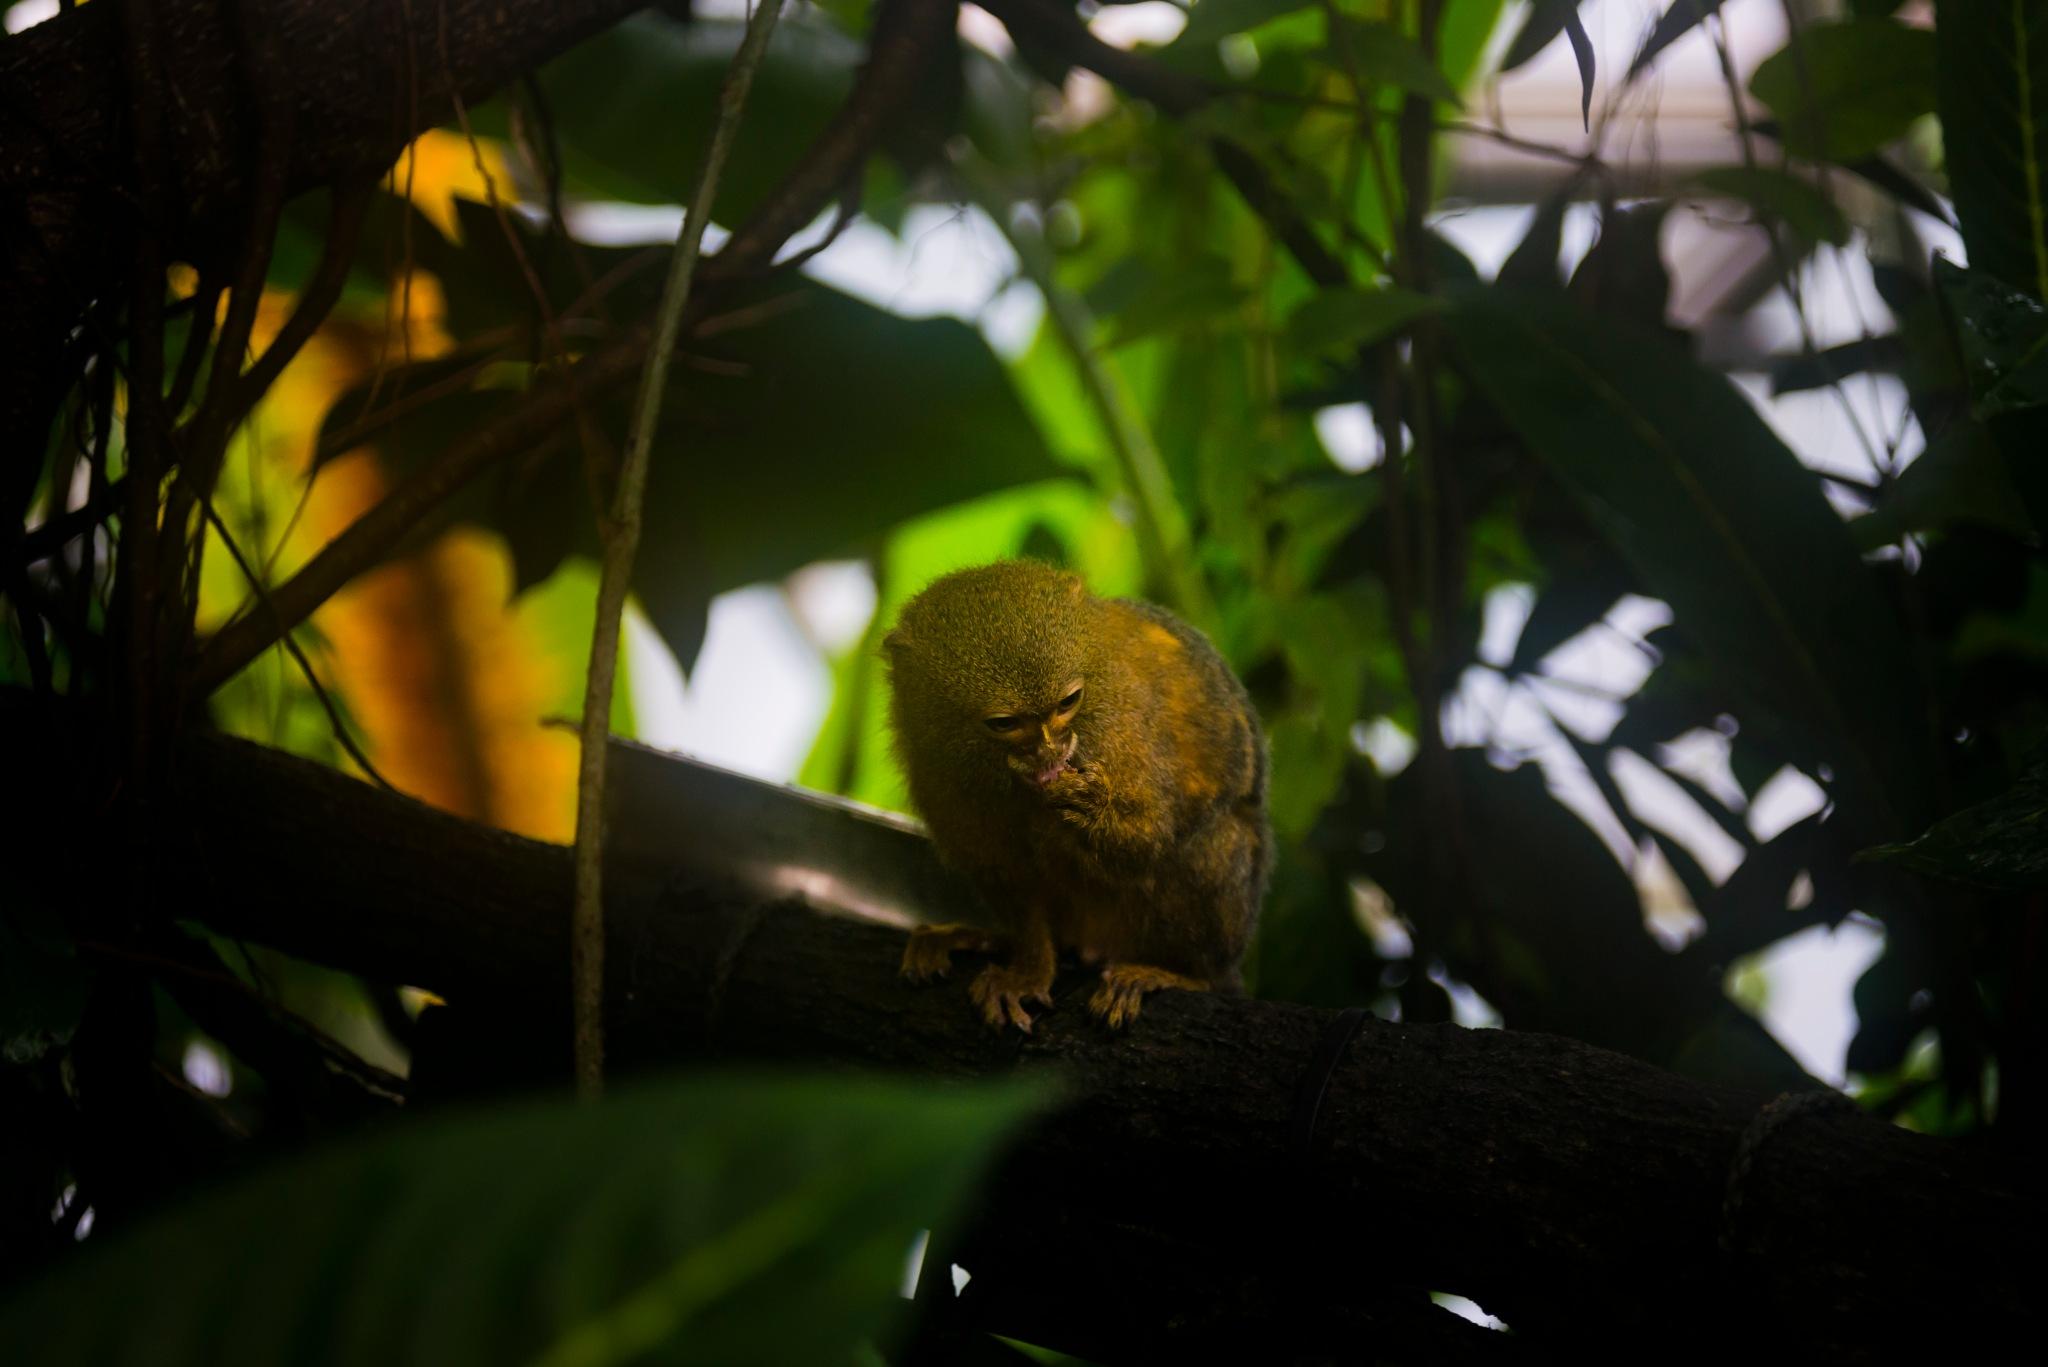 Tiny monkey - on a branch by Steen Skov